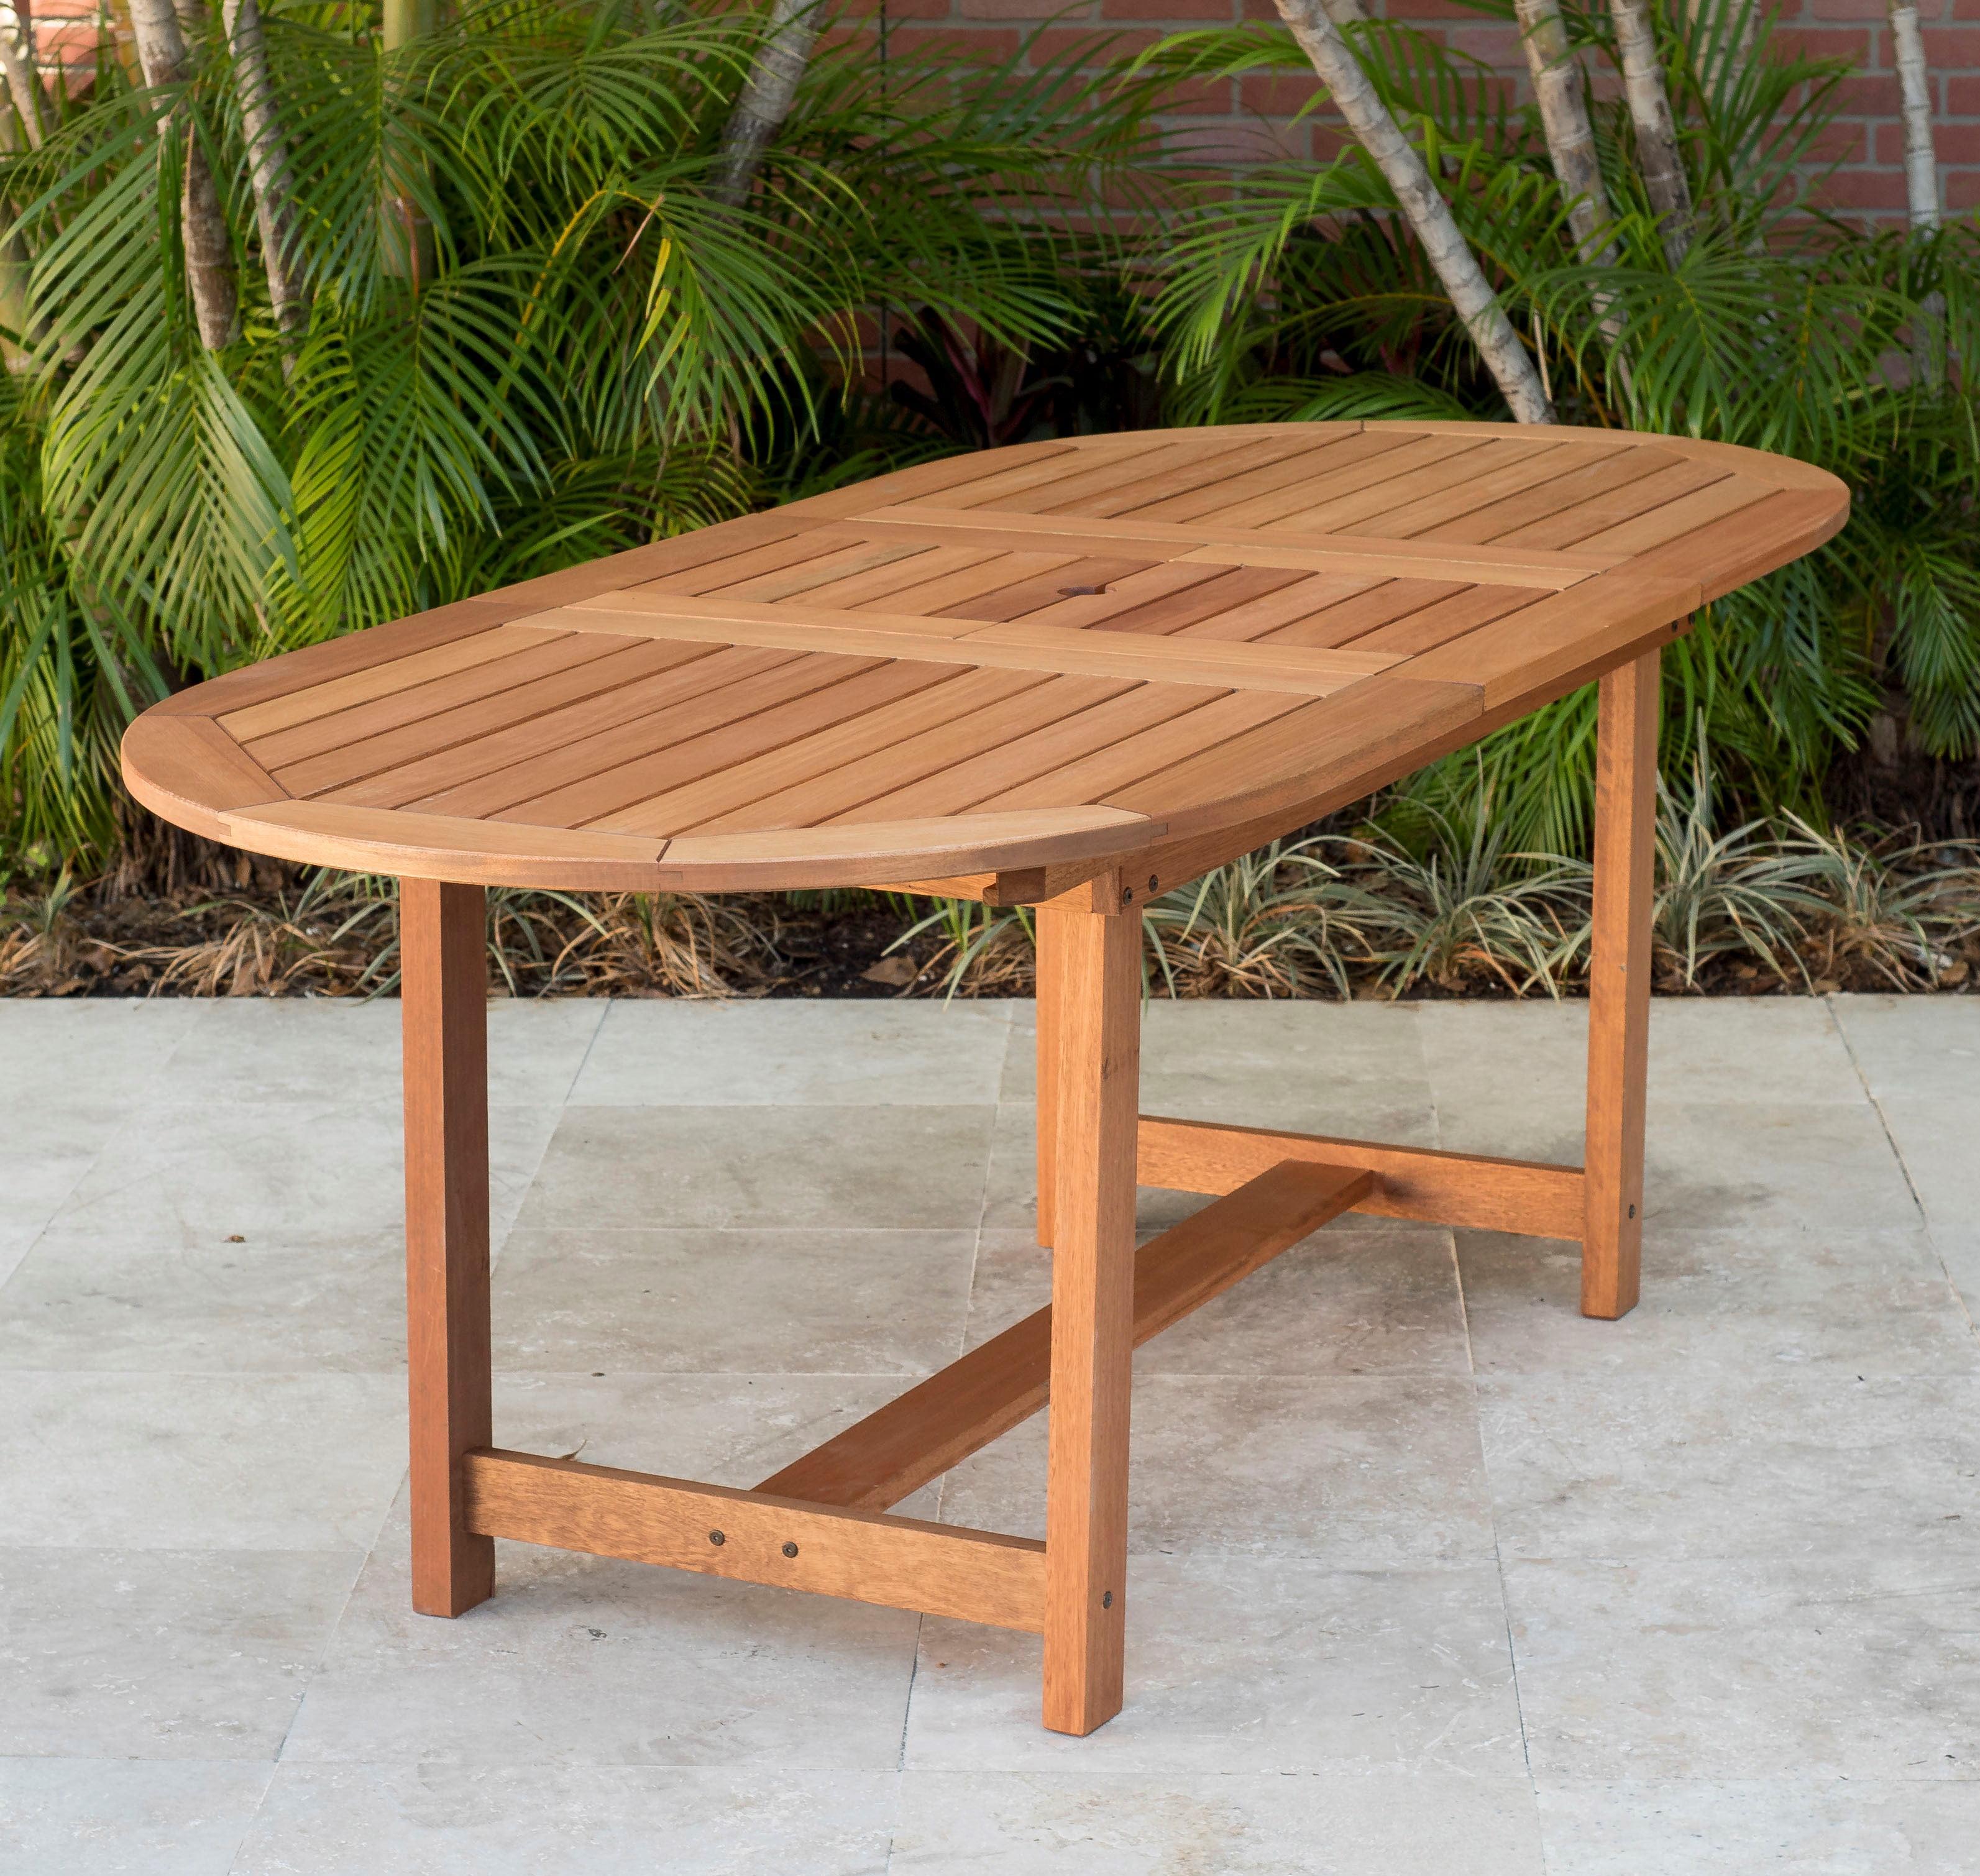 Amazonia Arizona 7 Piece Patio Extendable Oval Table Dining Set Eucalyptus Wood Ideal For Outdoors And Indoors Walmart Com Walmart Com